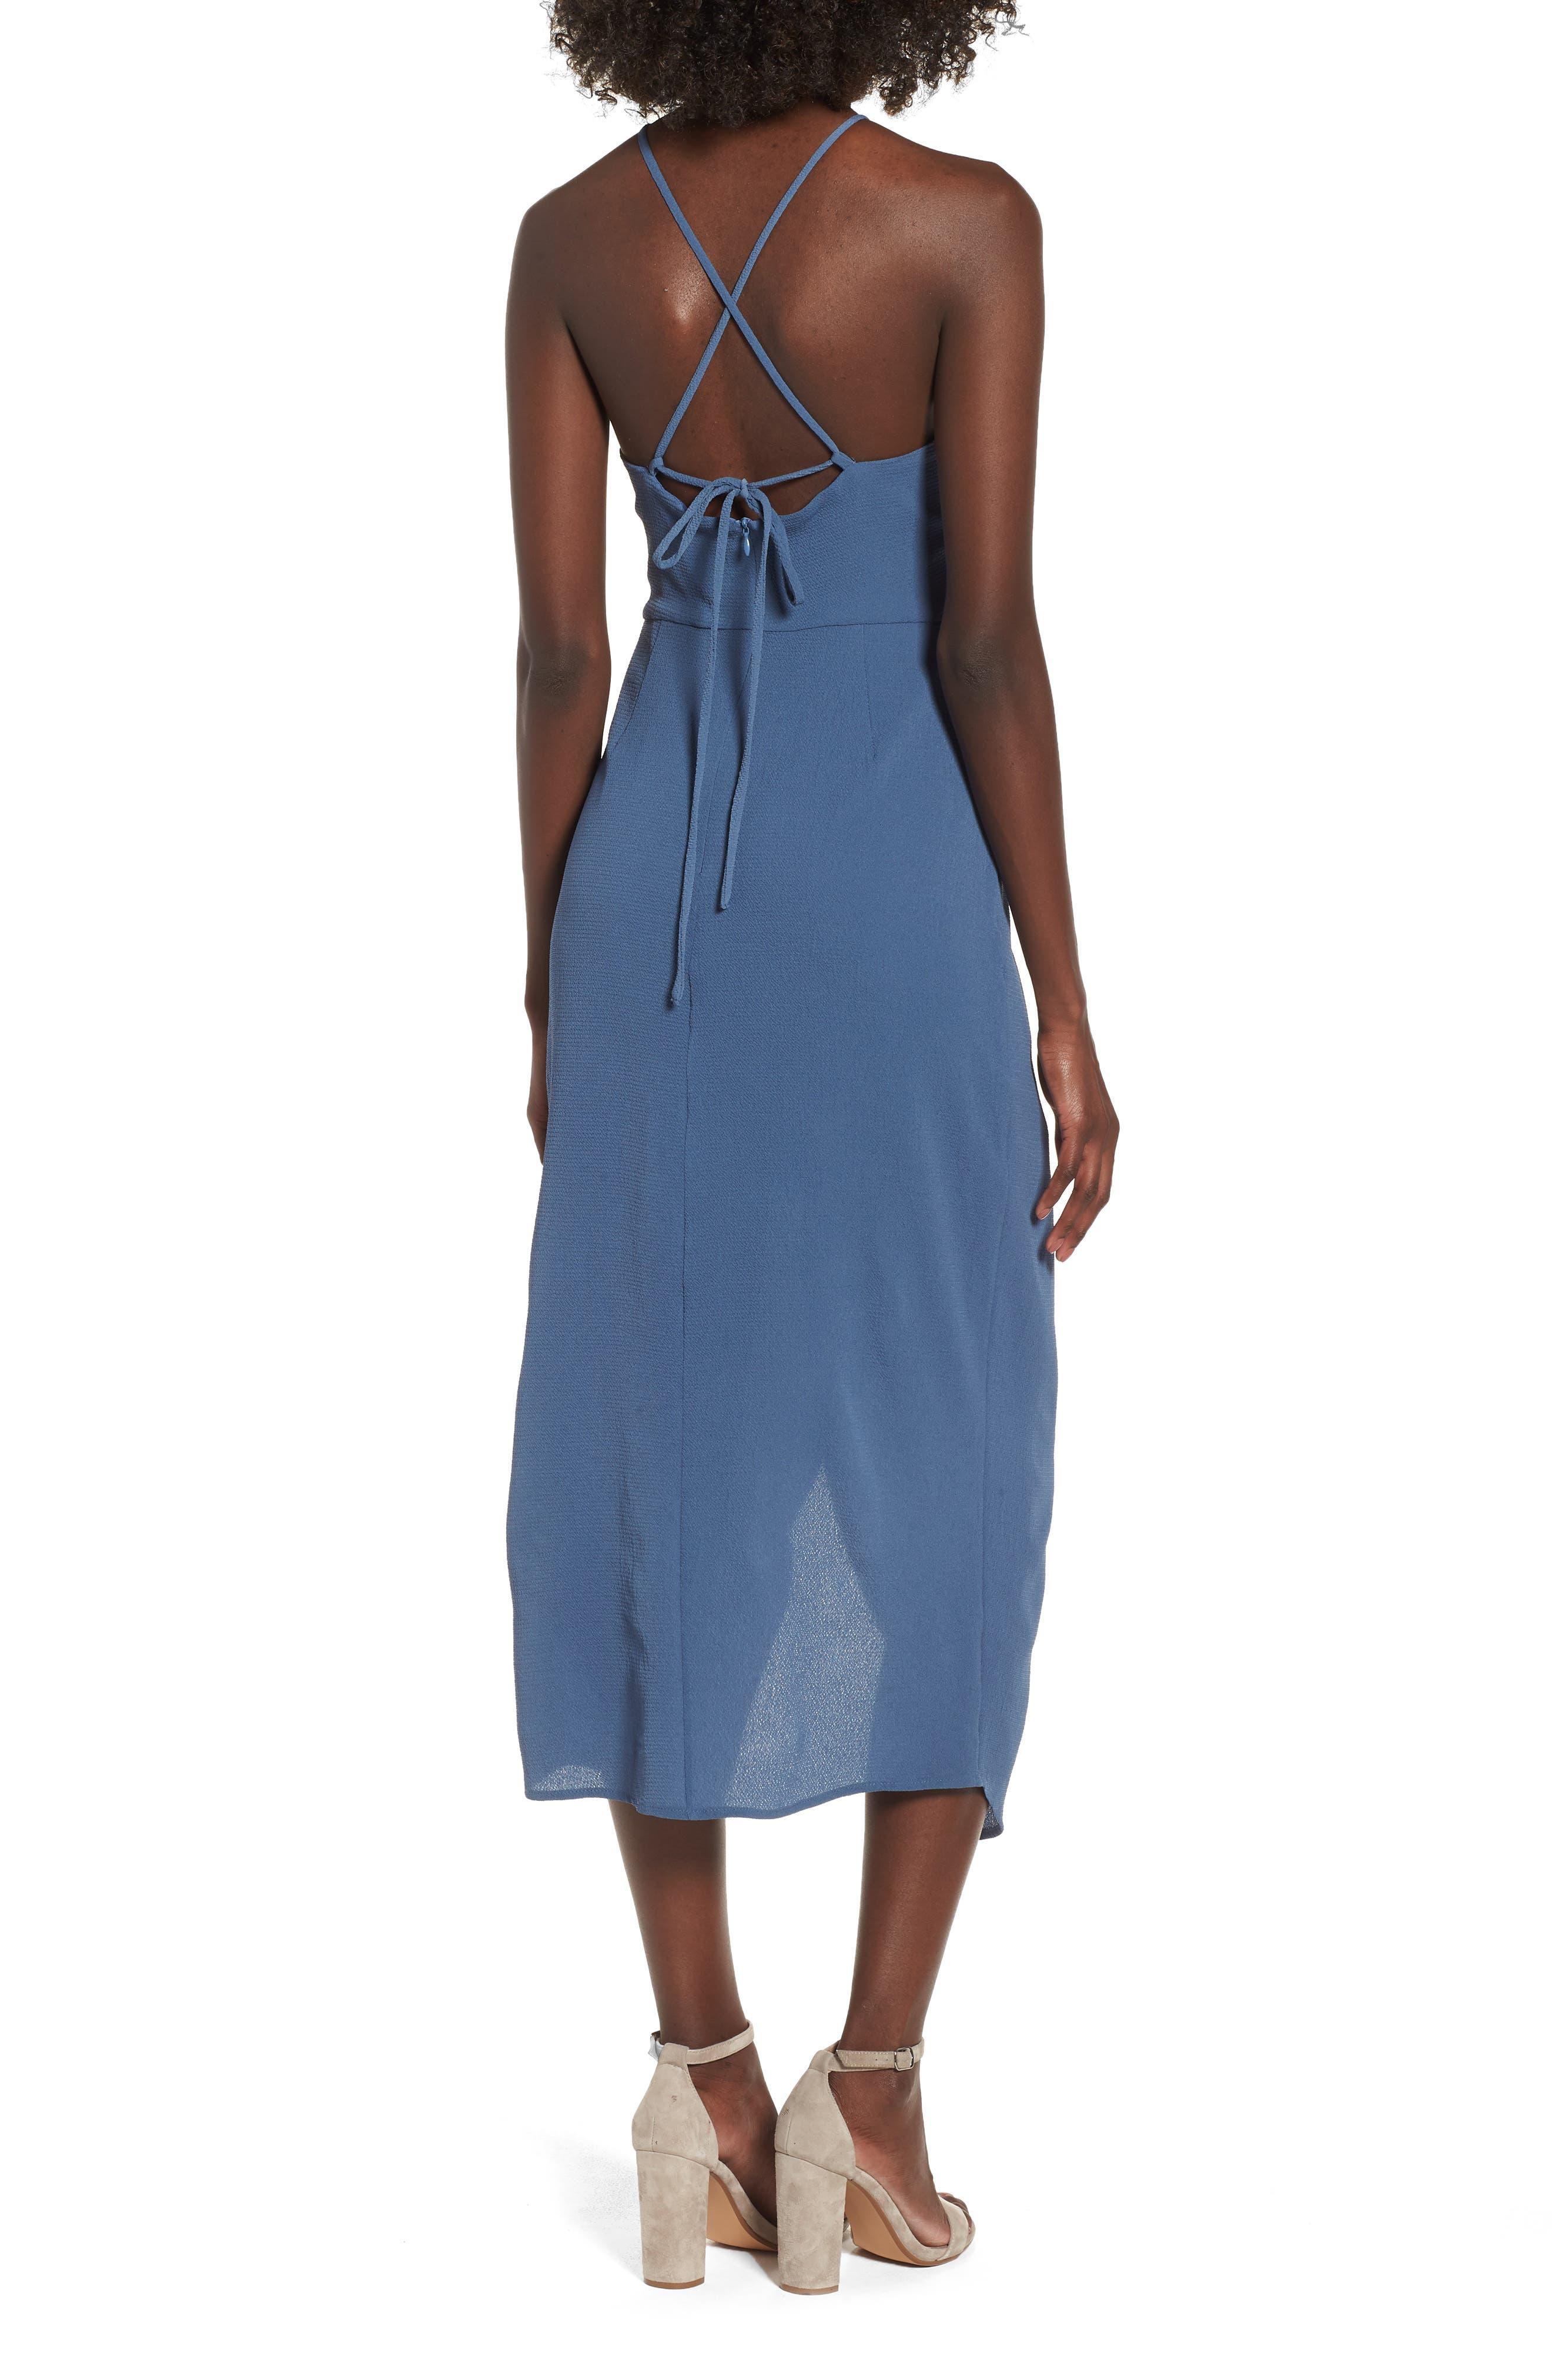 Wrap Midi Dress,                             Alternate thumbnail 2, color,                             Dusty Teal